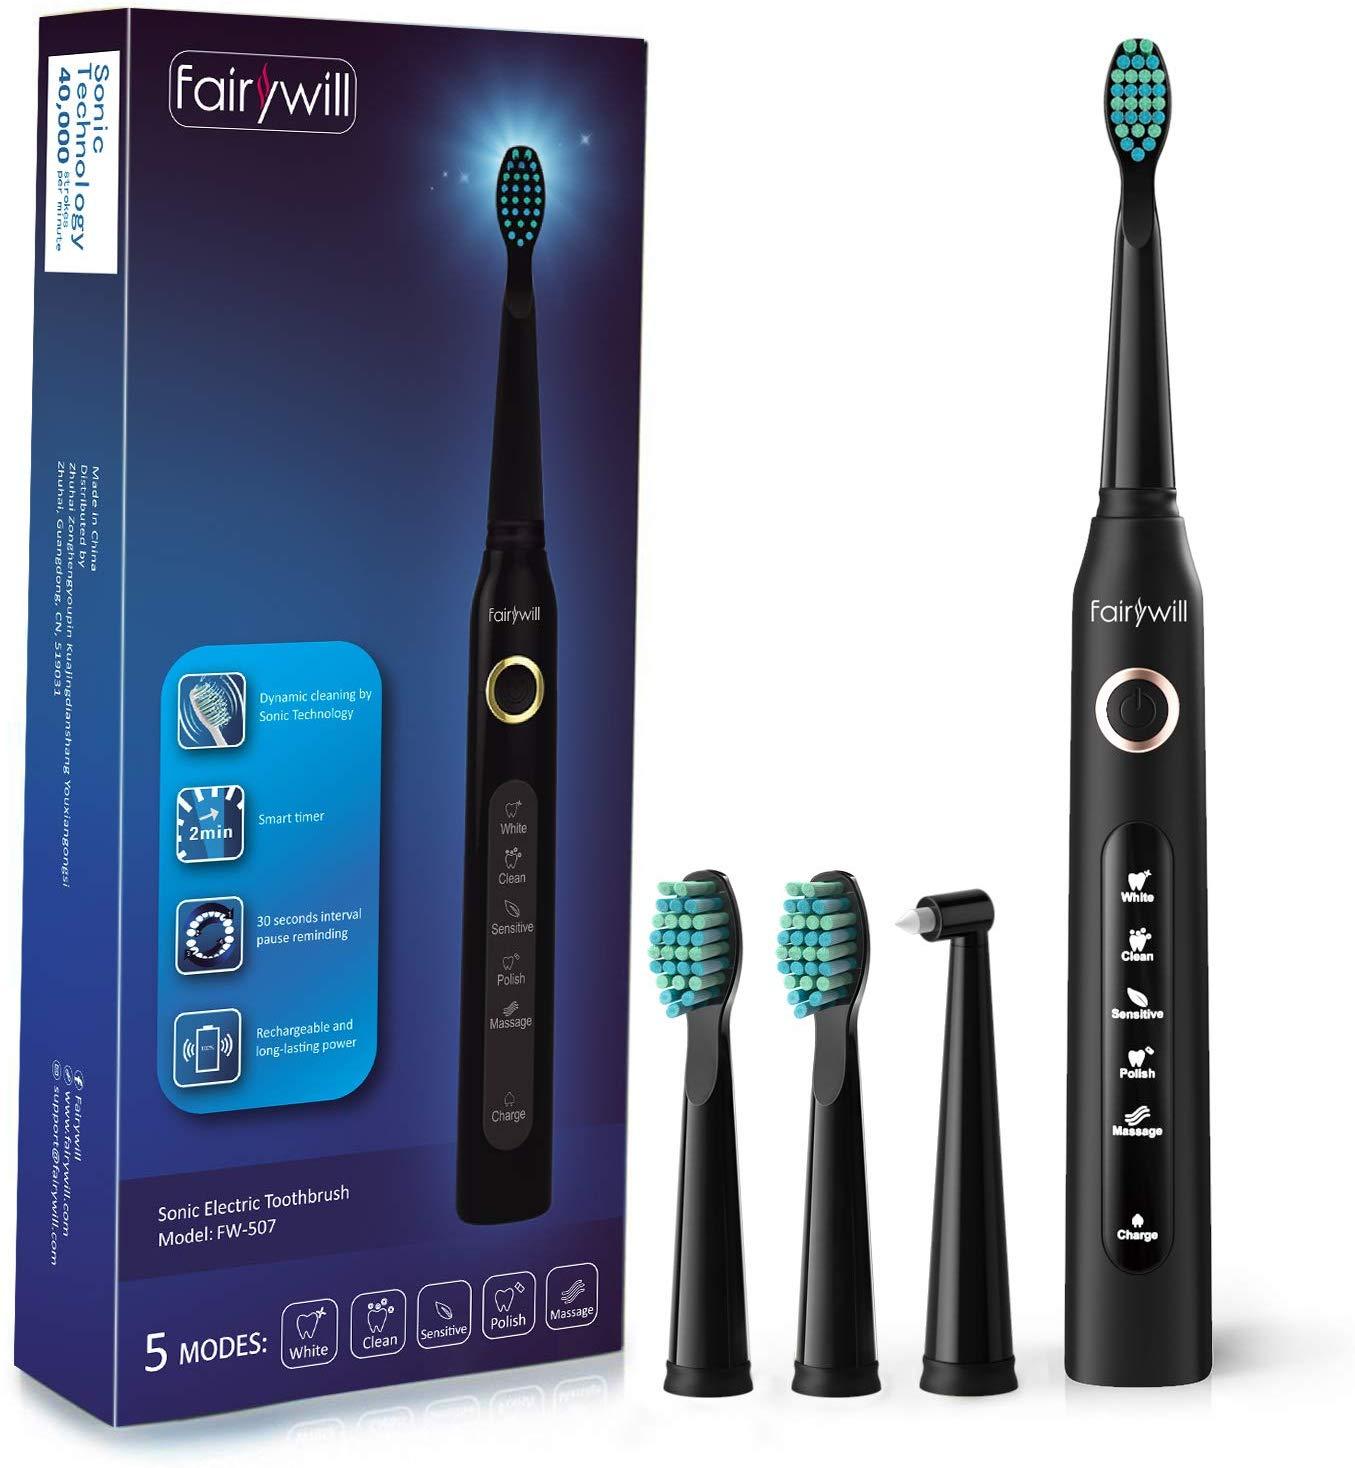 Fairywill Sonic Toothbrush 5 Optional Modes,3 Brush Heads Black for £15.29 Prime